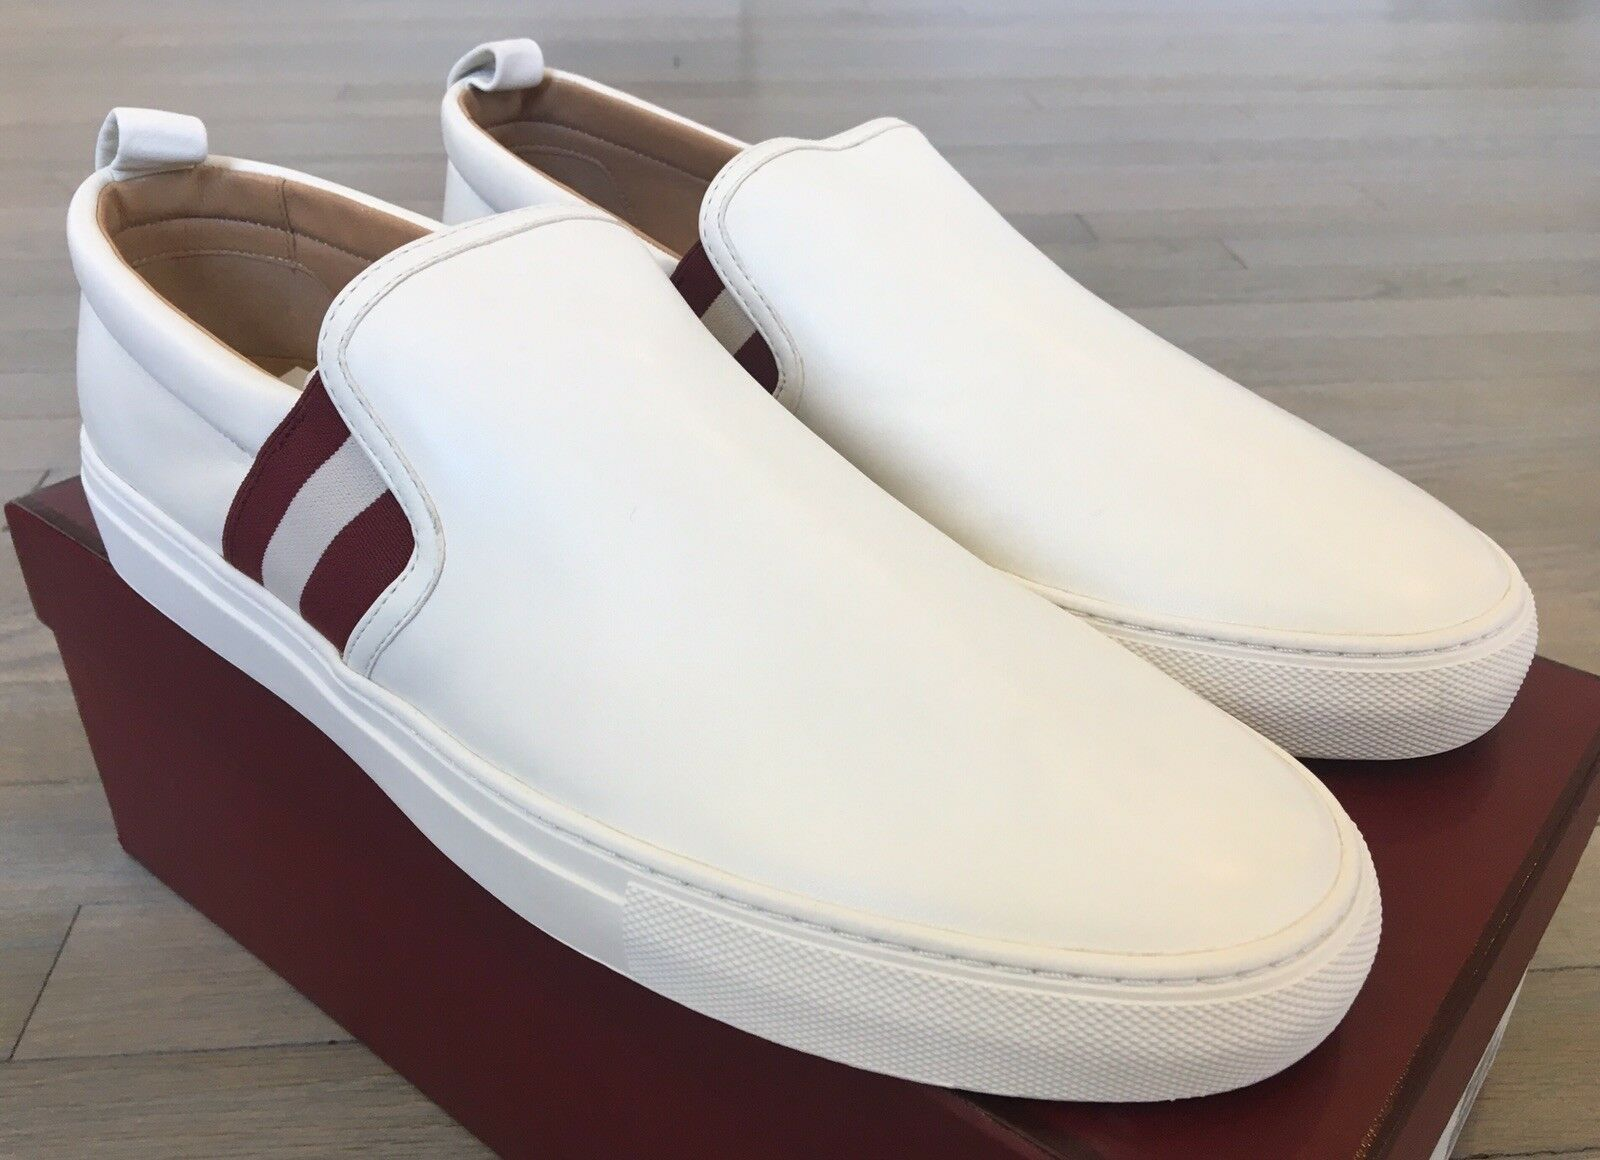 550  Bally Herald 67 White Leather Slip on shoes size US 12.5